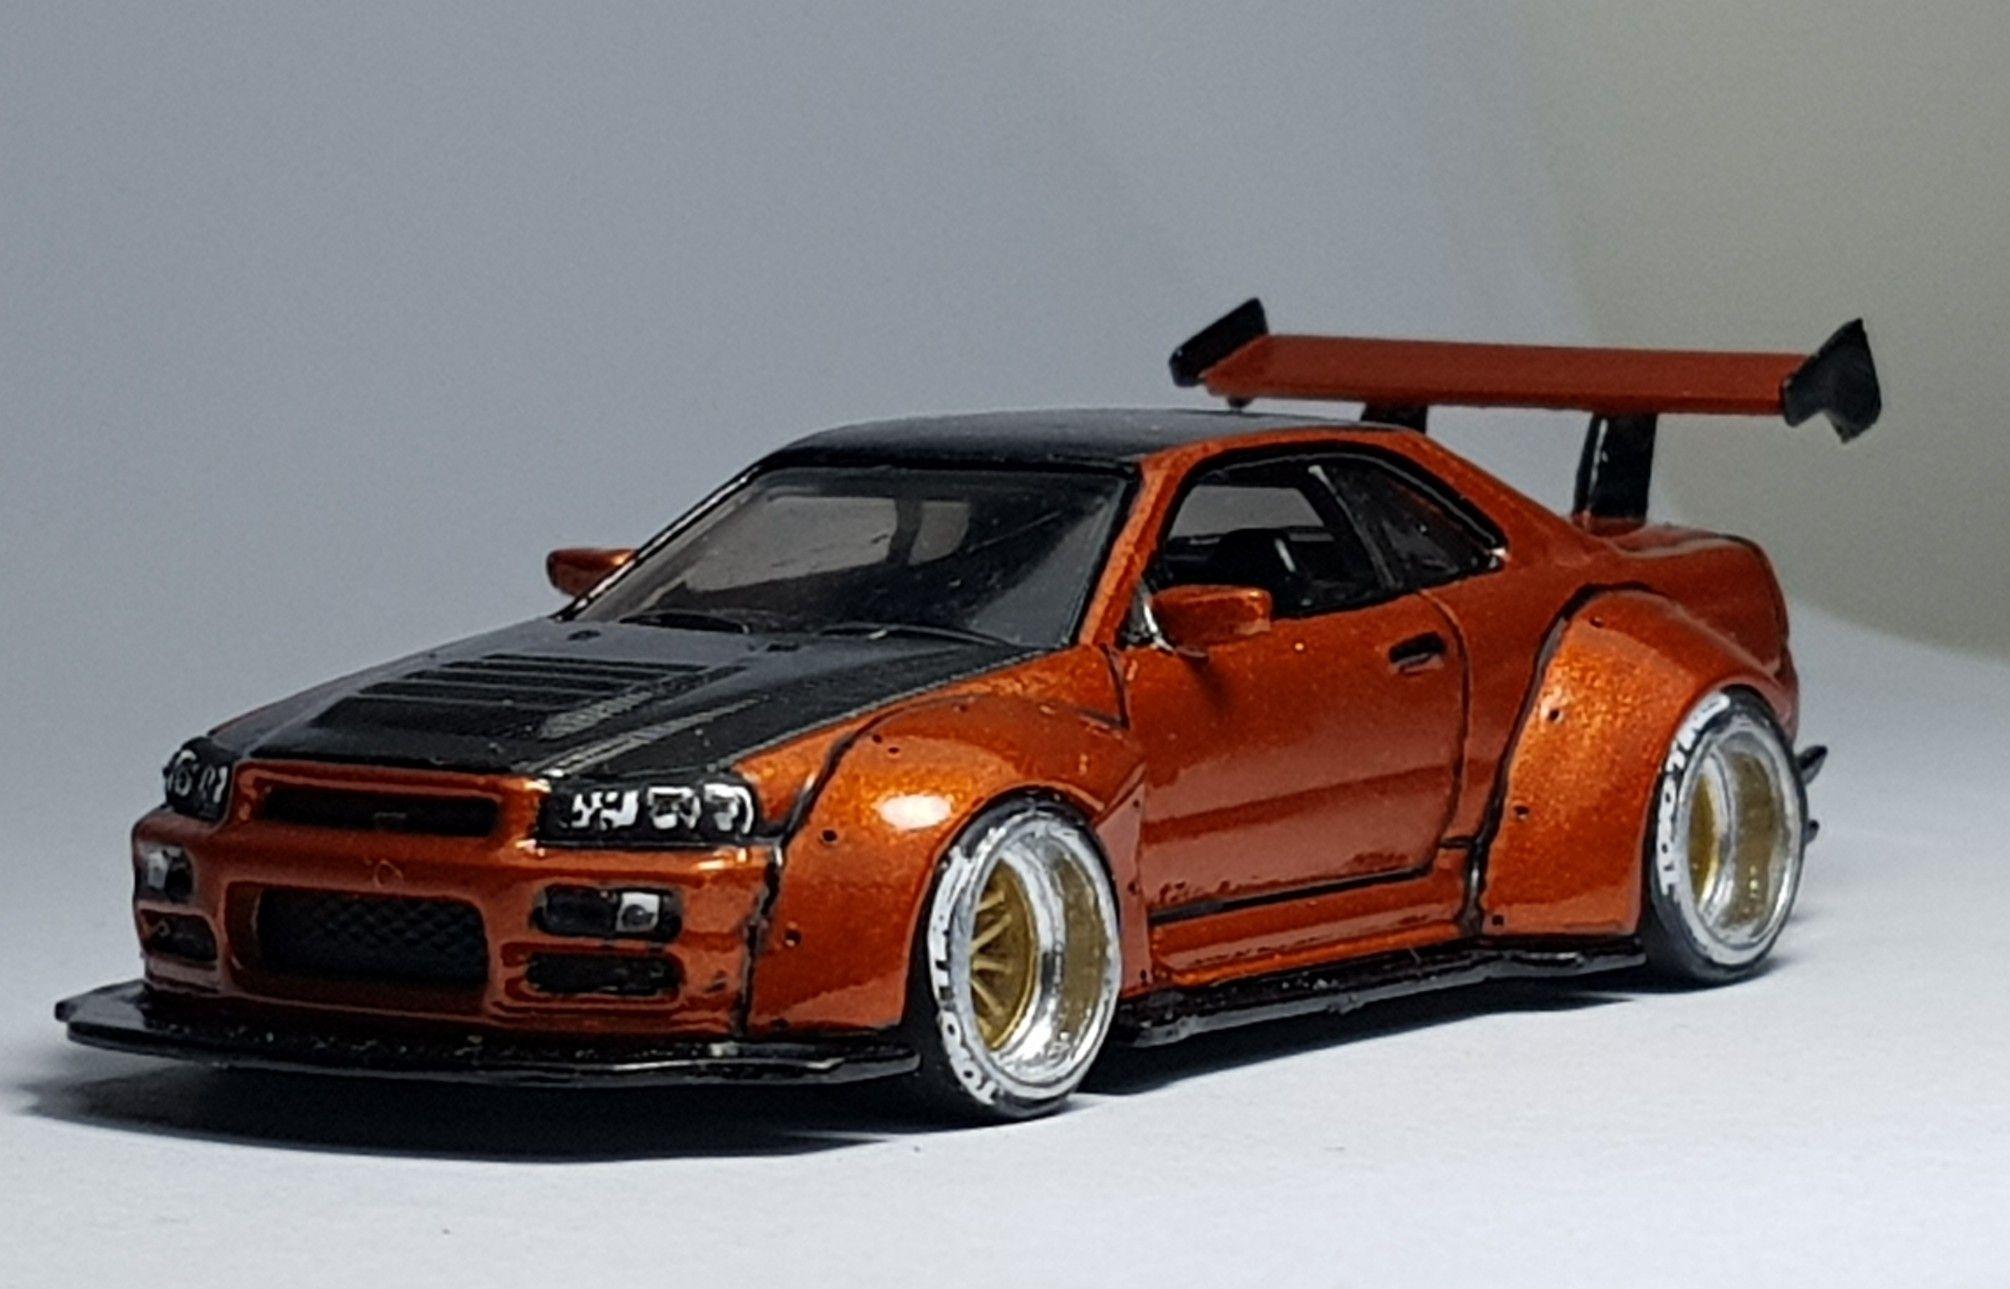 My Hotwheels Custom Nissan Skyline R34 Jon Sibal Style Custom Hot Wheels Hot Wheels Toys Hot Wheels Garage